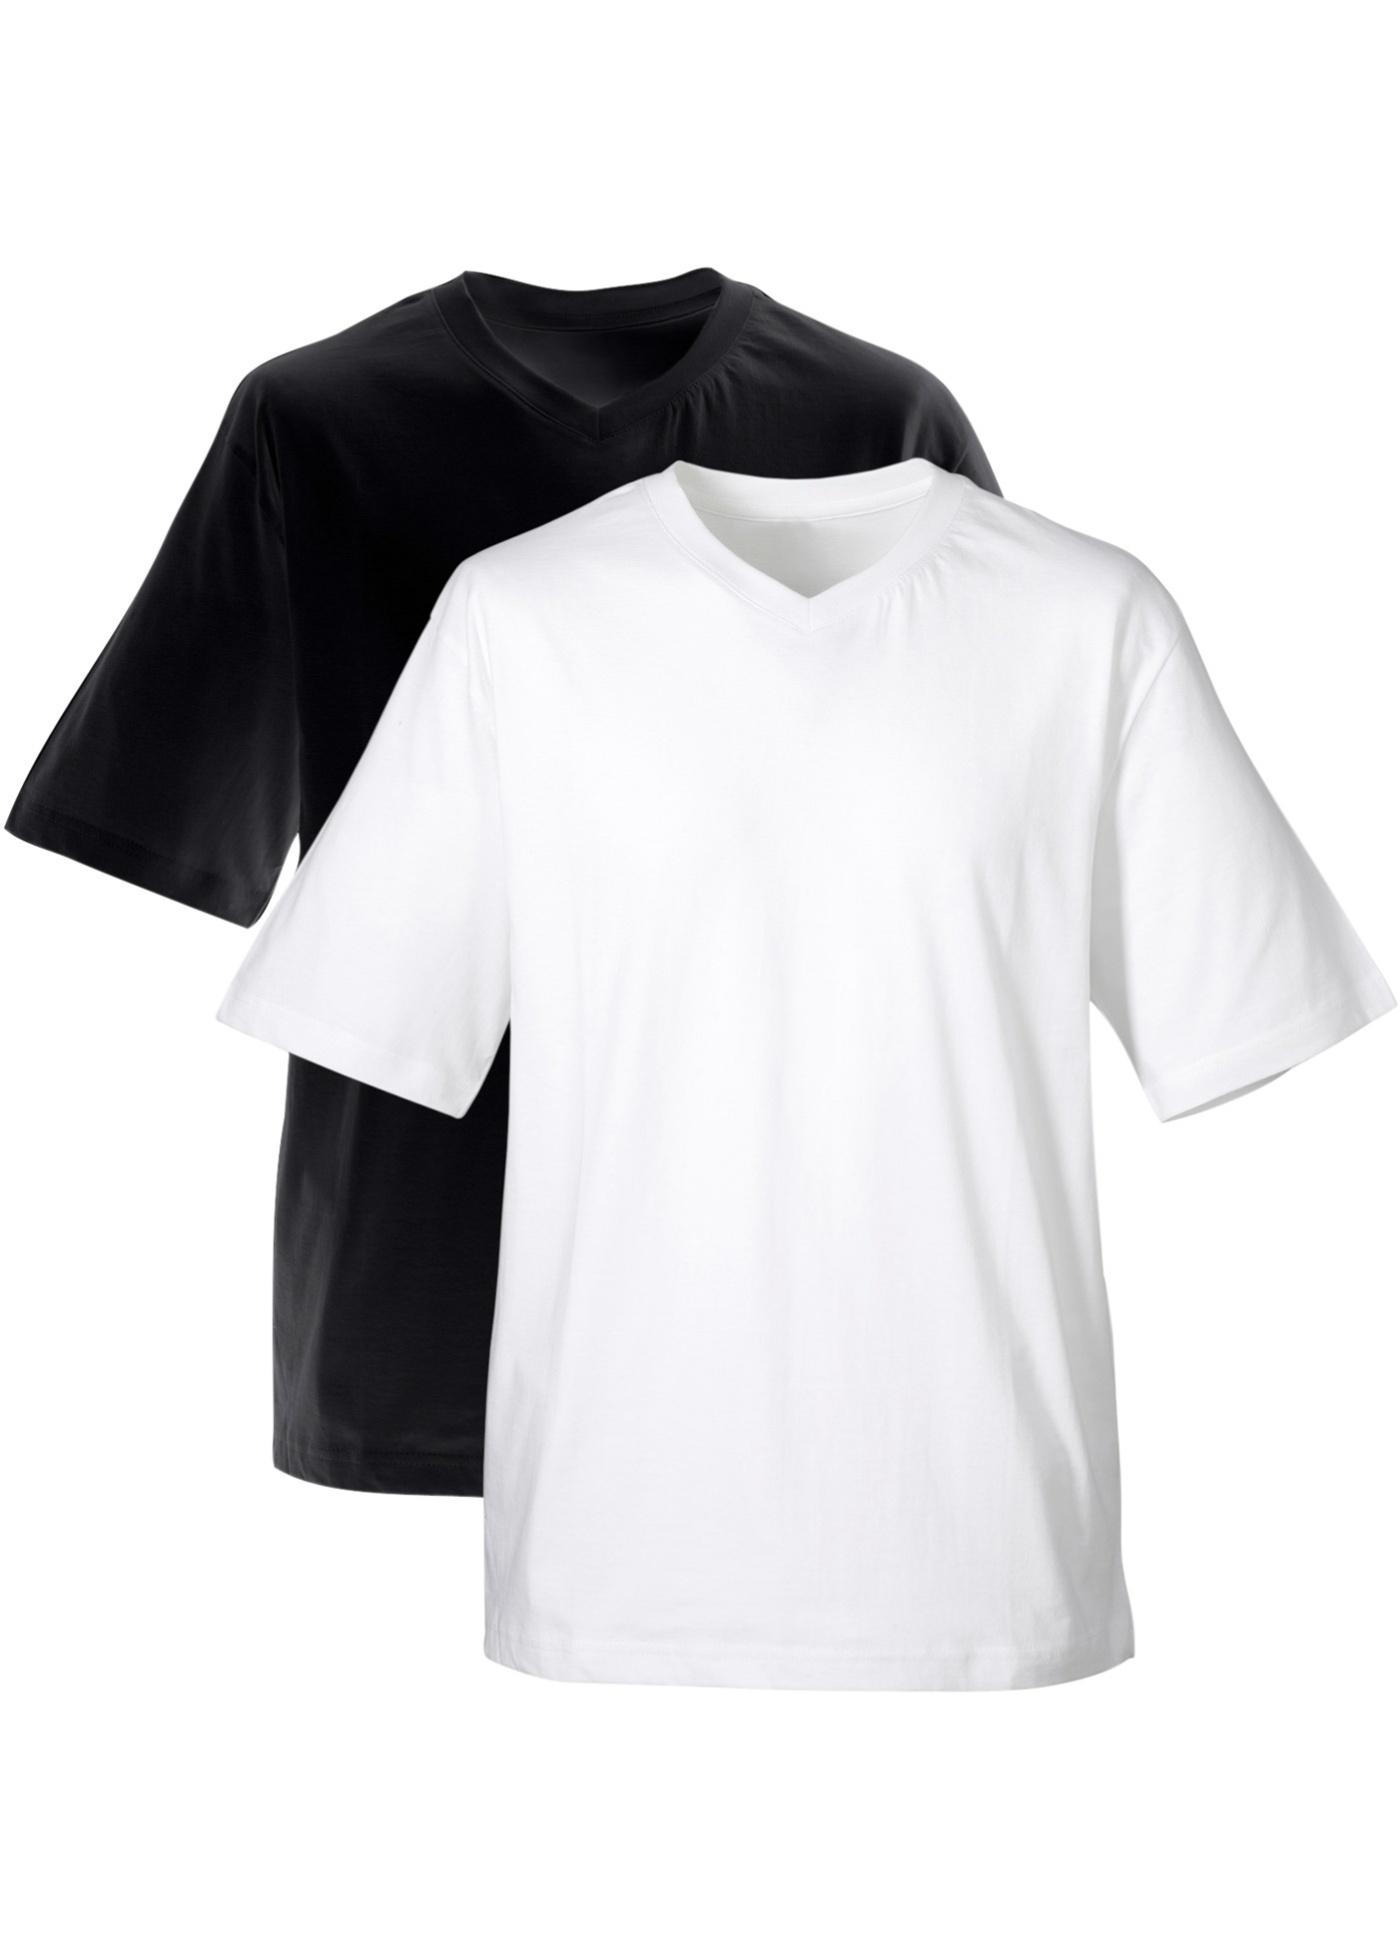 Herren T-Shirt mit V-Ausschnitt (2er-Pack)